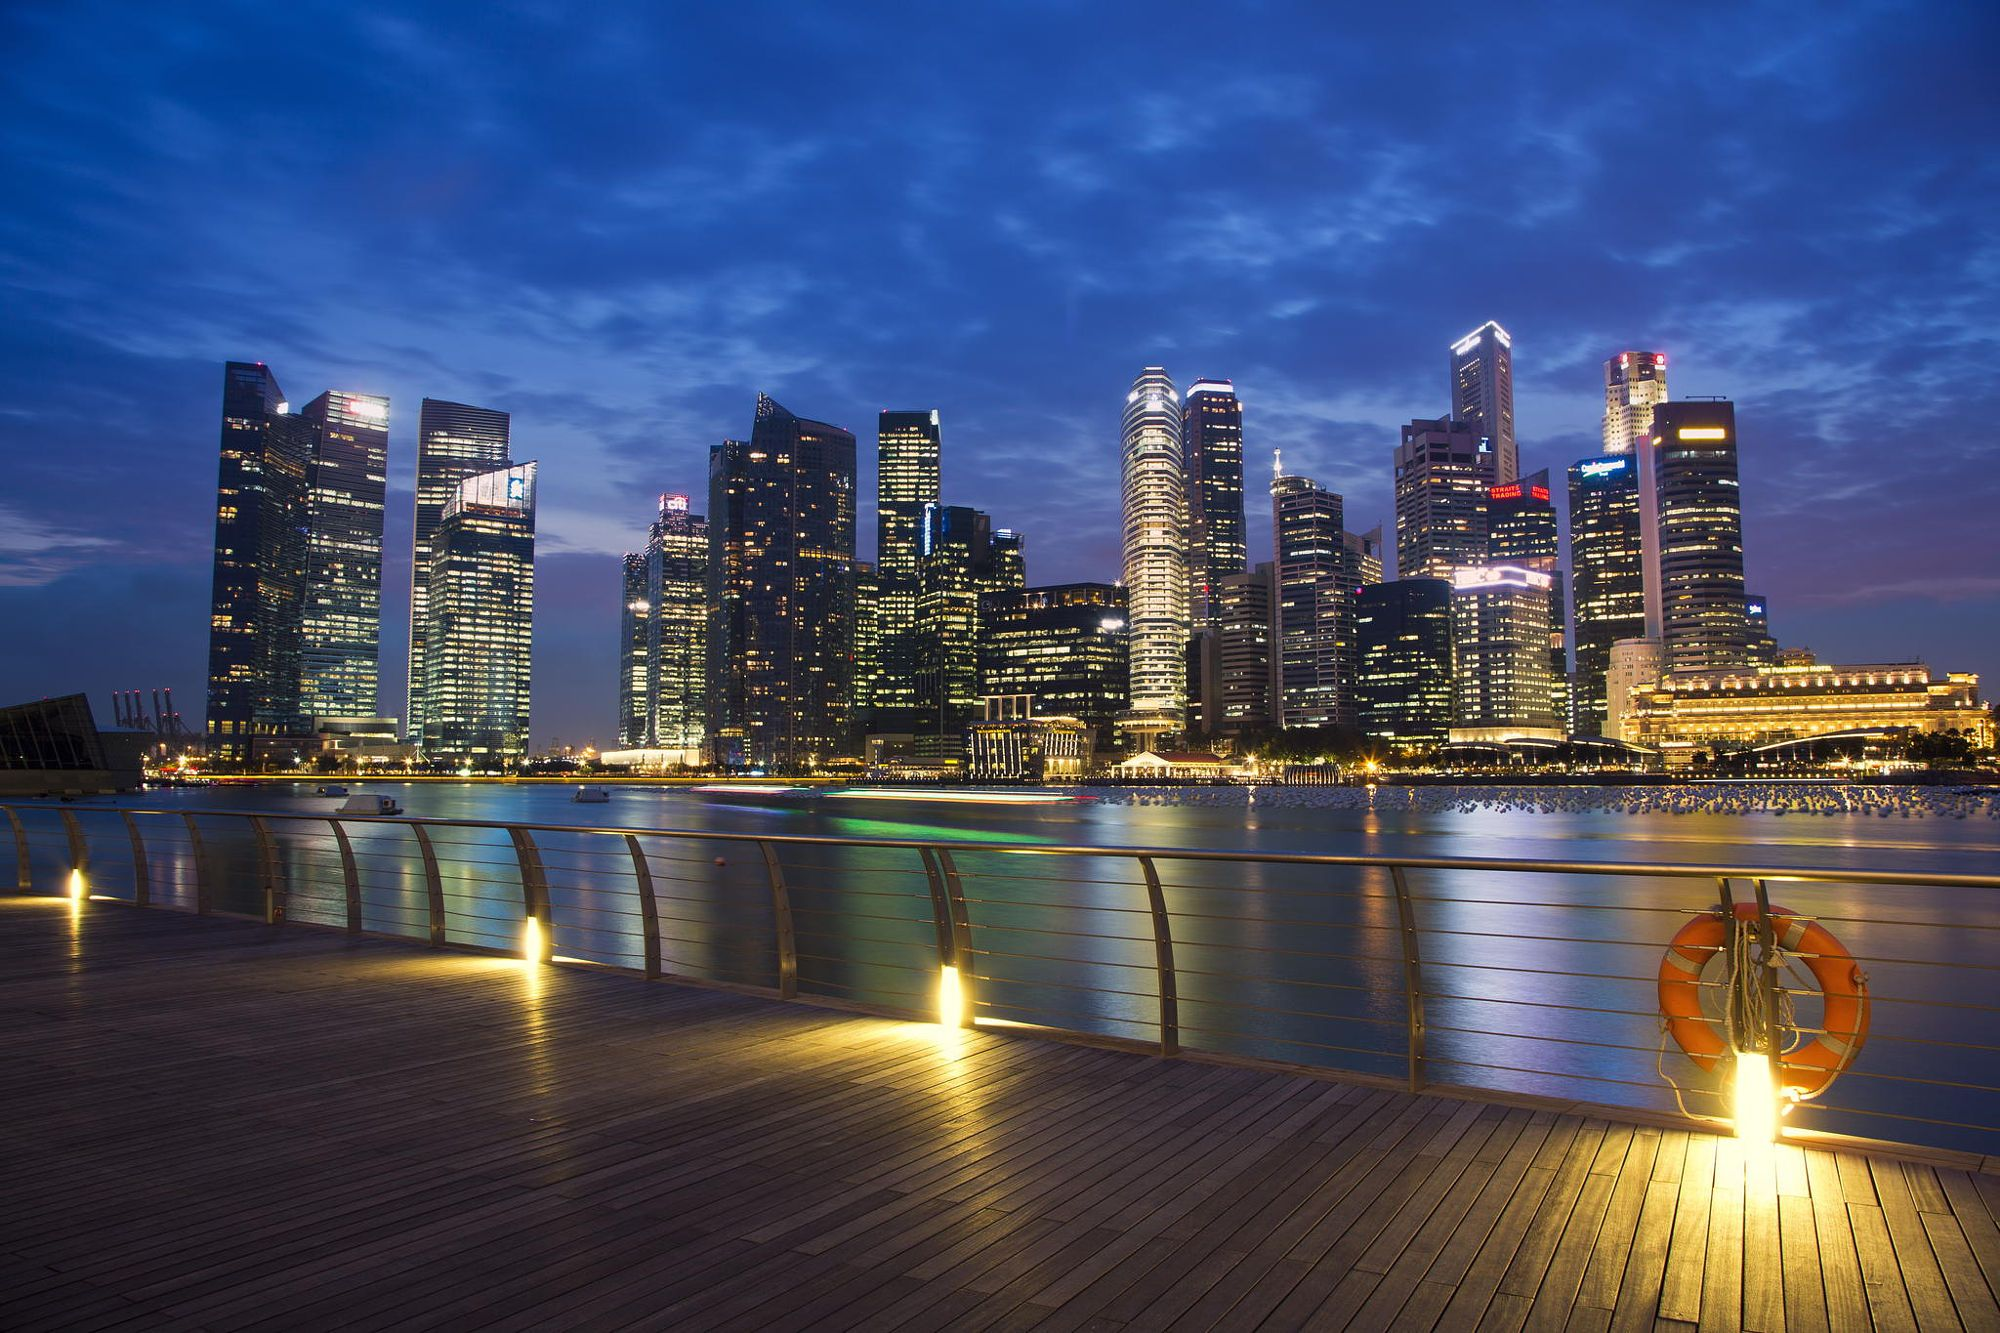 Marina Bay by Bryan Leung